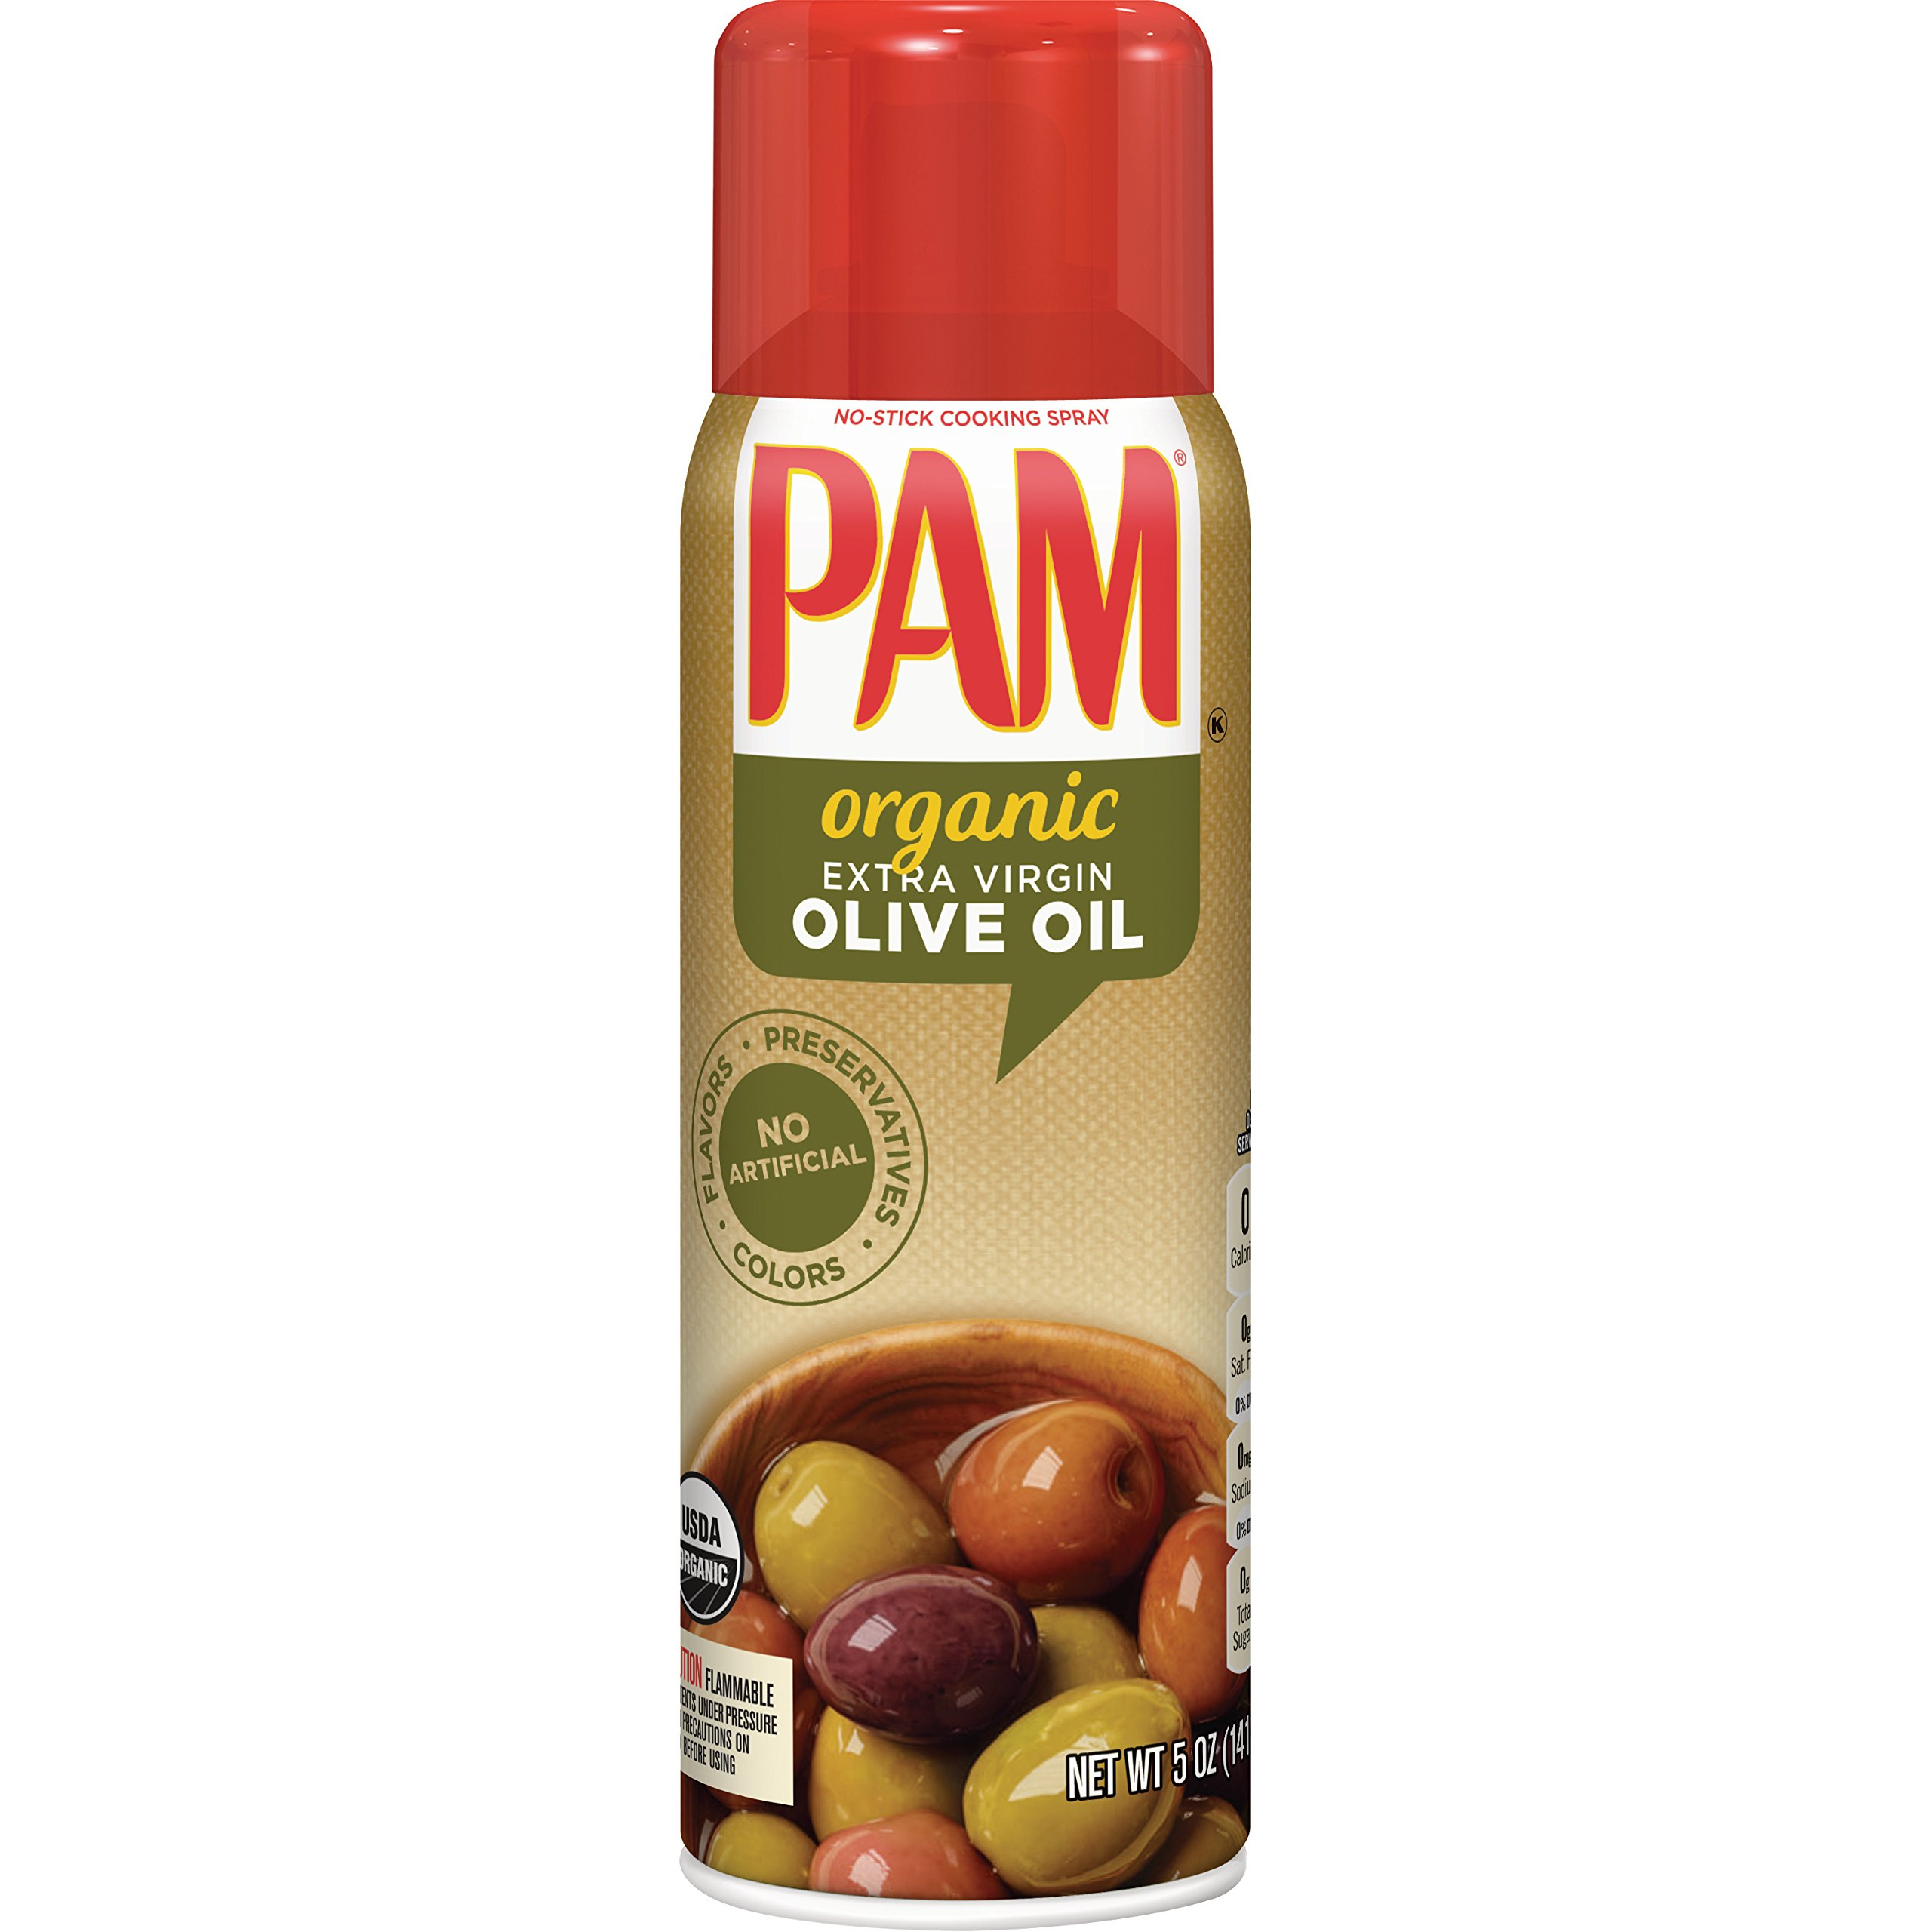 PAM Organic Olive, 5 oz